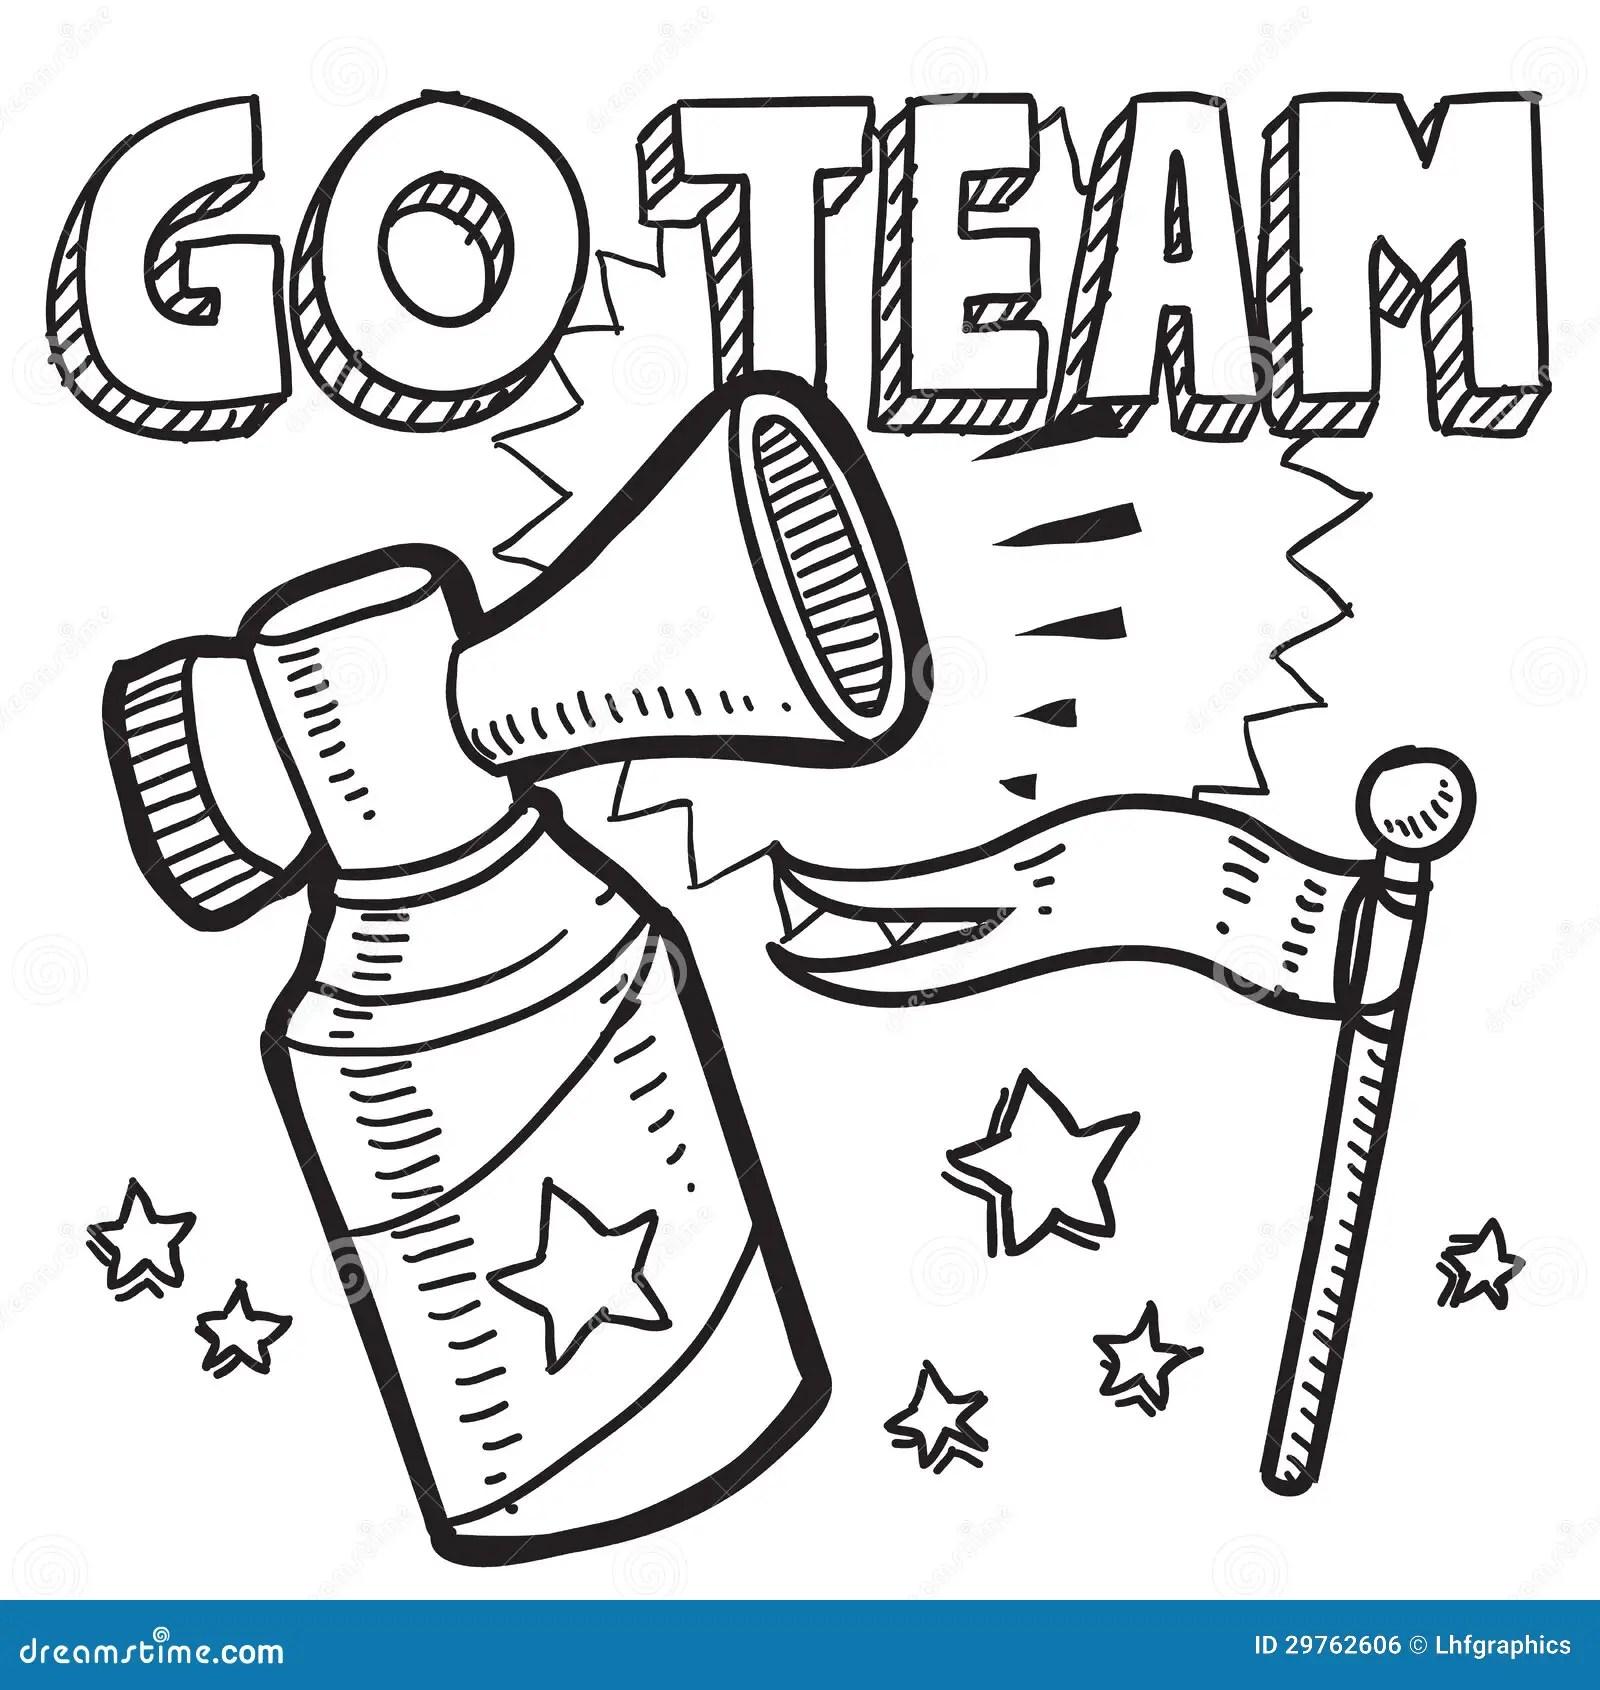 Go Team Sports Air Horn Sketch Stock Vector